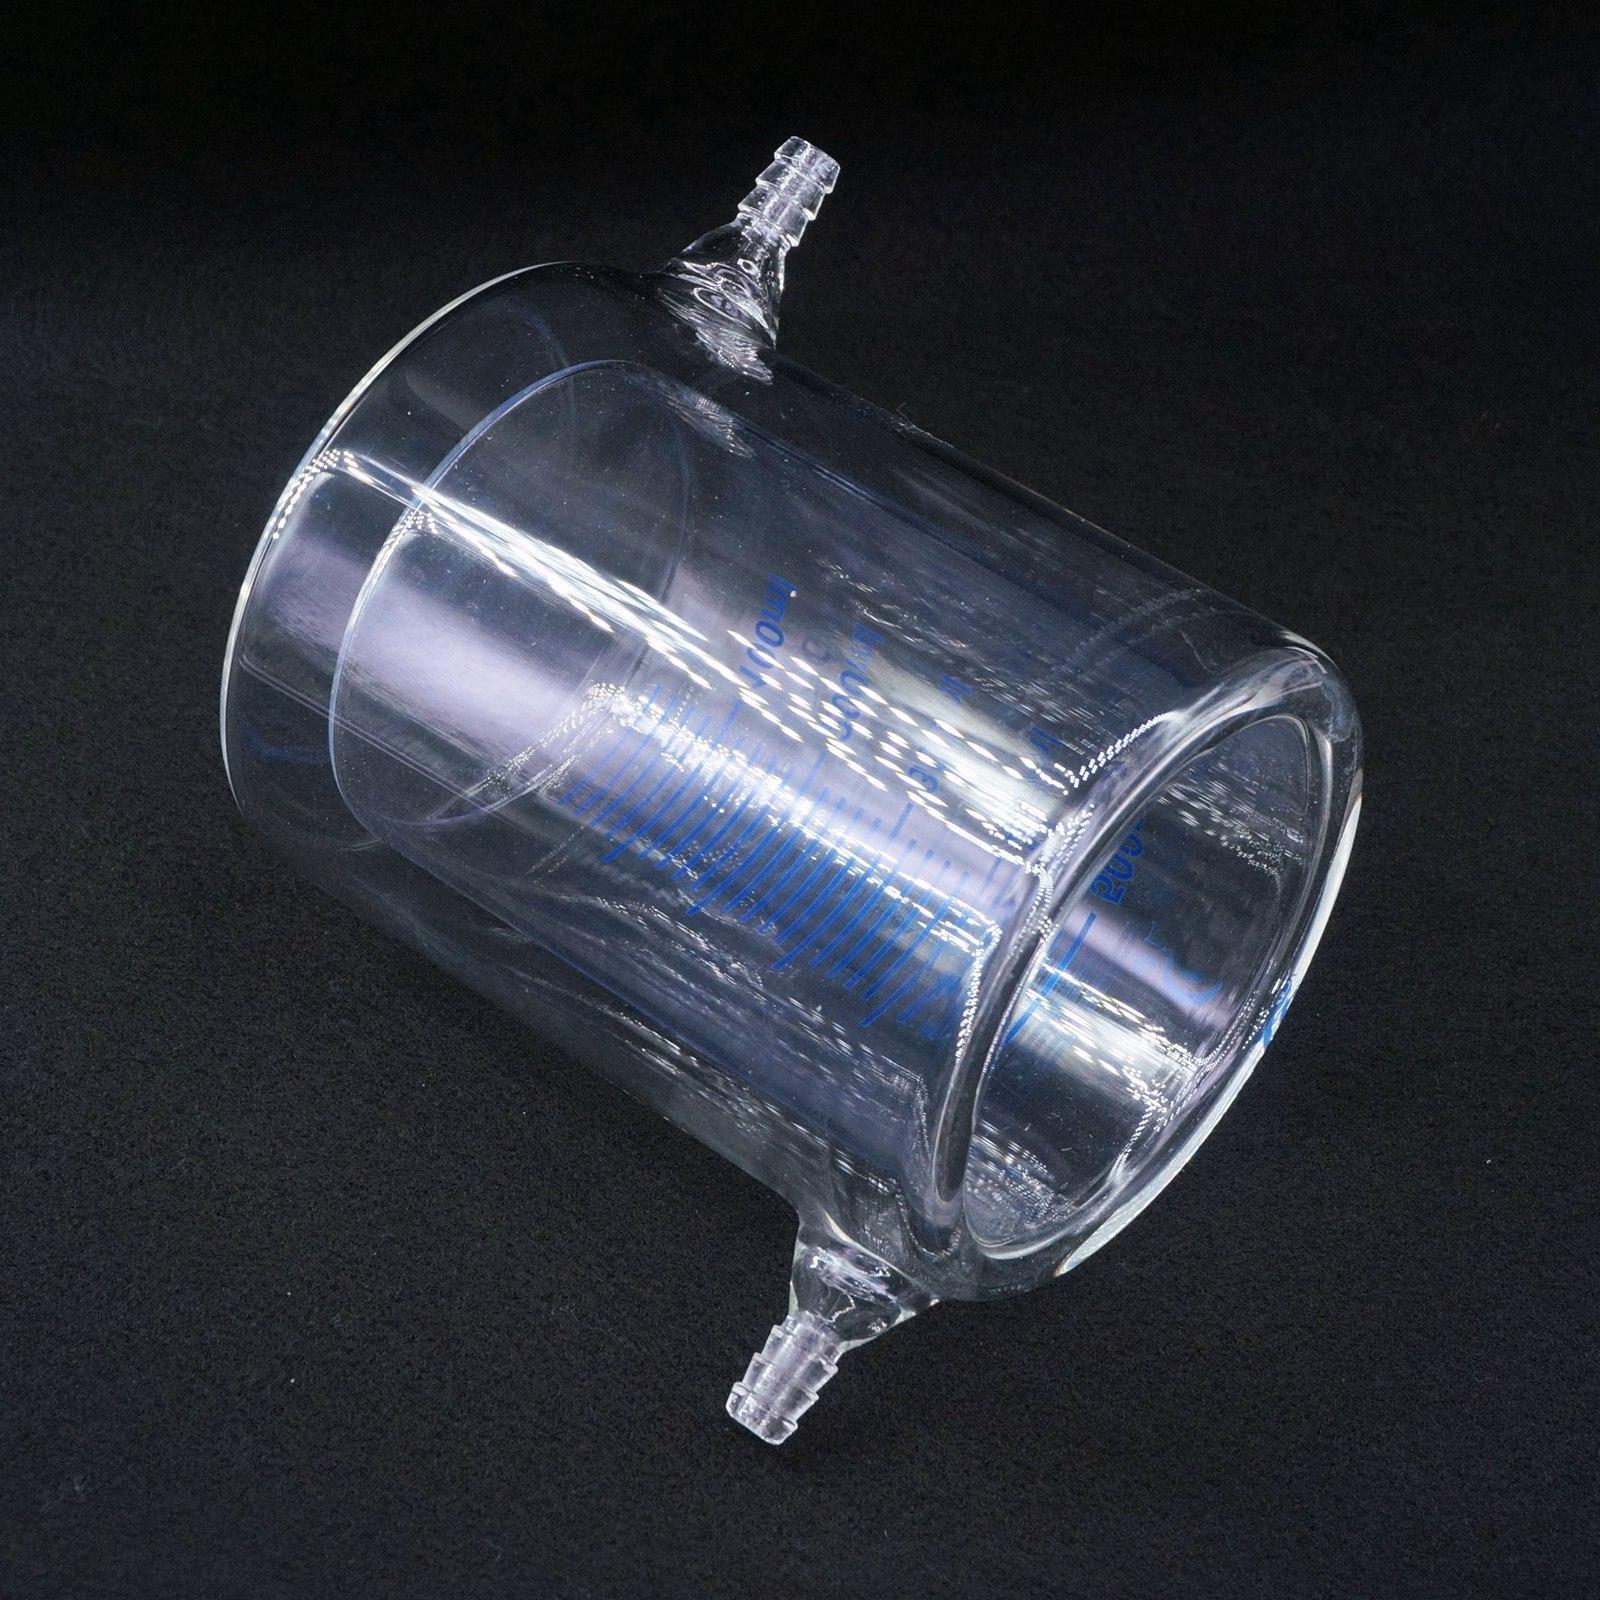 500ml Laboratory Jacketed Borosilicate Glass Beaker Double Layer Beaker for Photocatalytic Experiment500ml Laboratory Jacketed Borosilicate Glass Beaker Double Layer Beaker for Photocatalytic Experiment